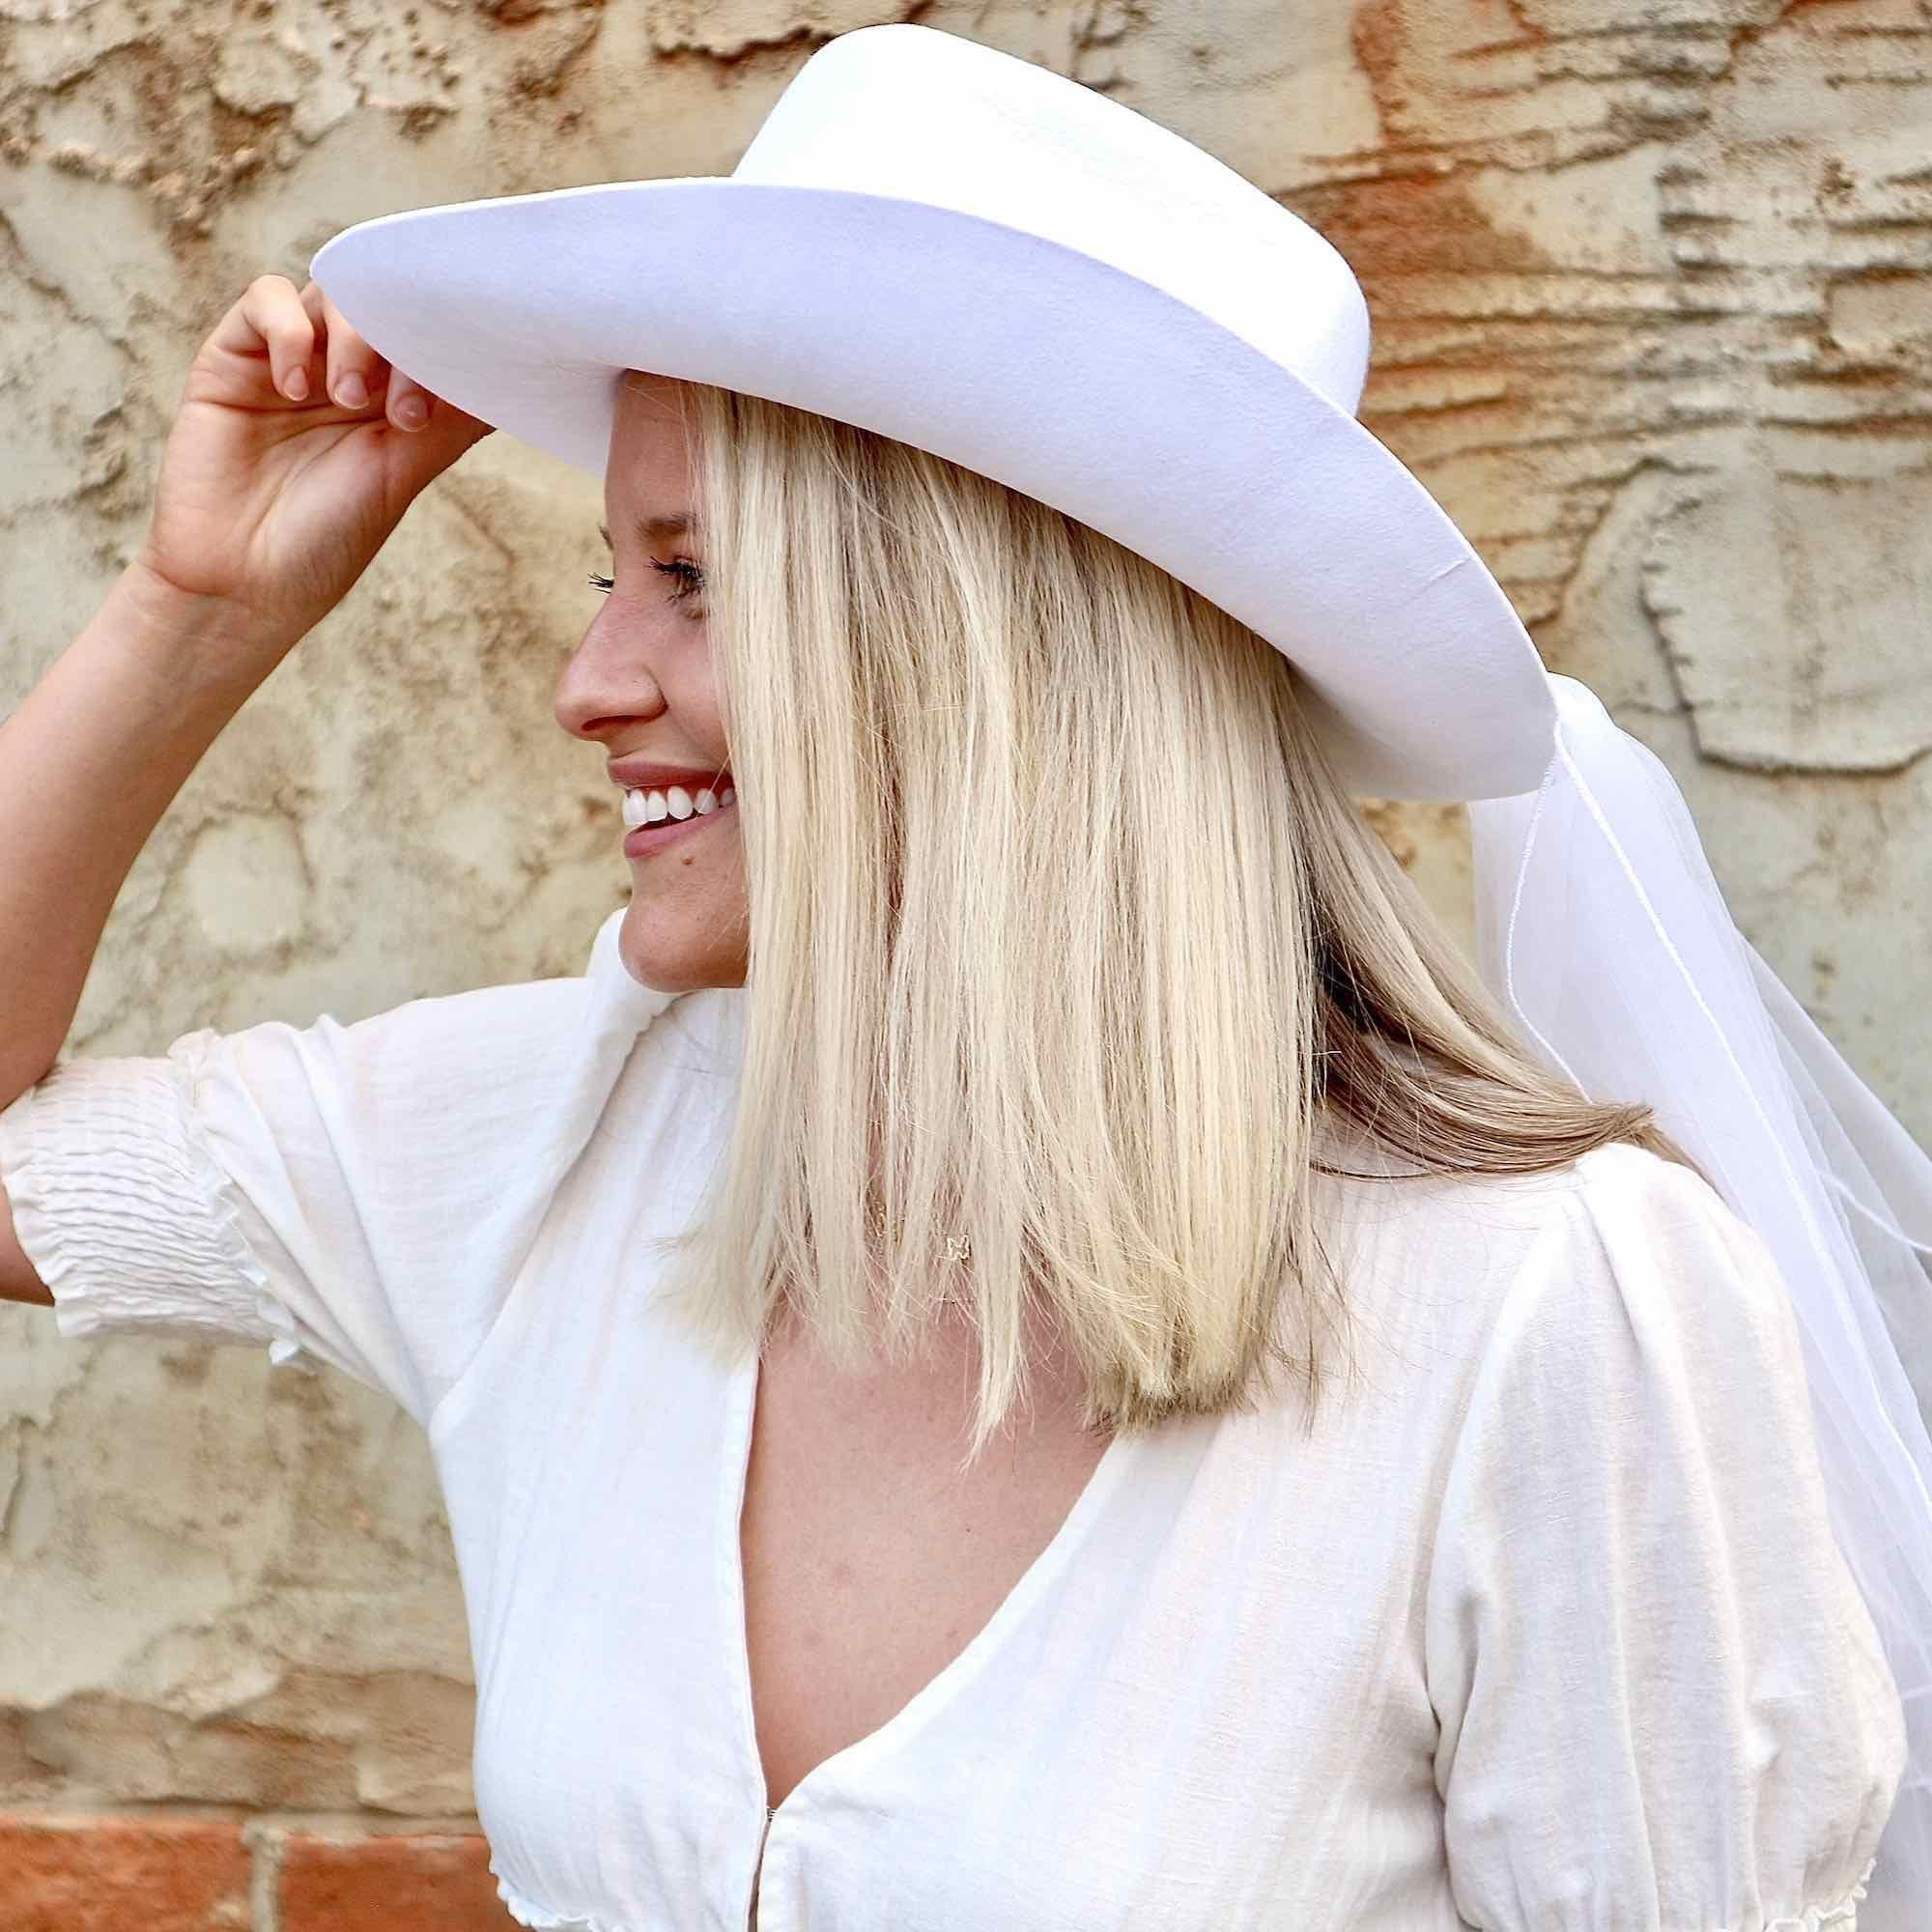 Cowboy Hat Veil In 2021 Western Bachelorette Country Western Bachelorette Party Bachelorette Party Veils